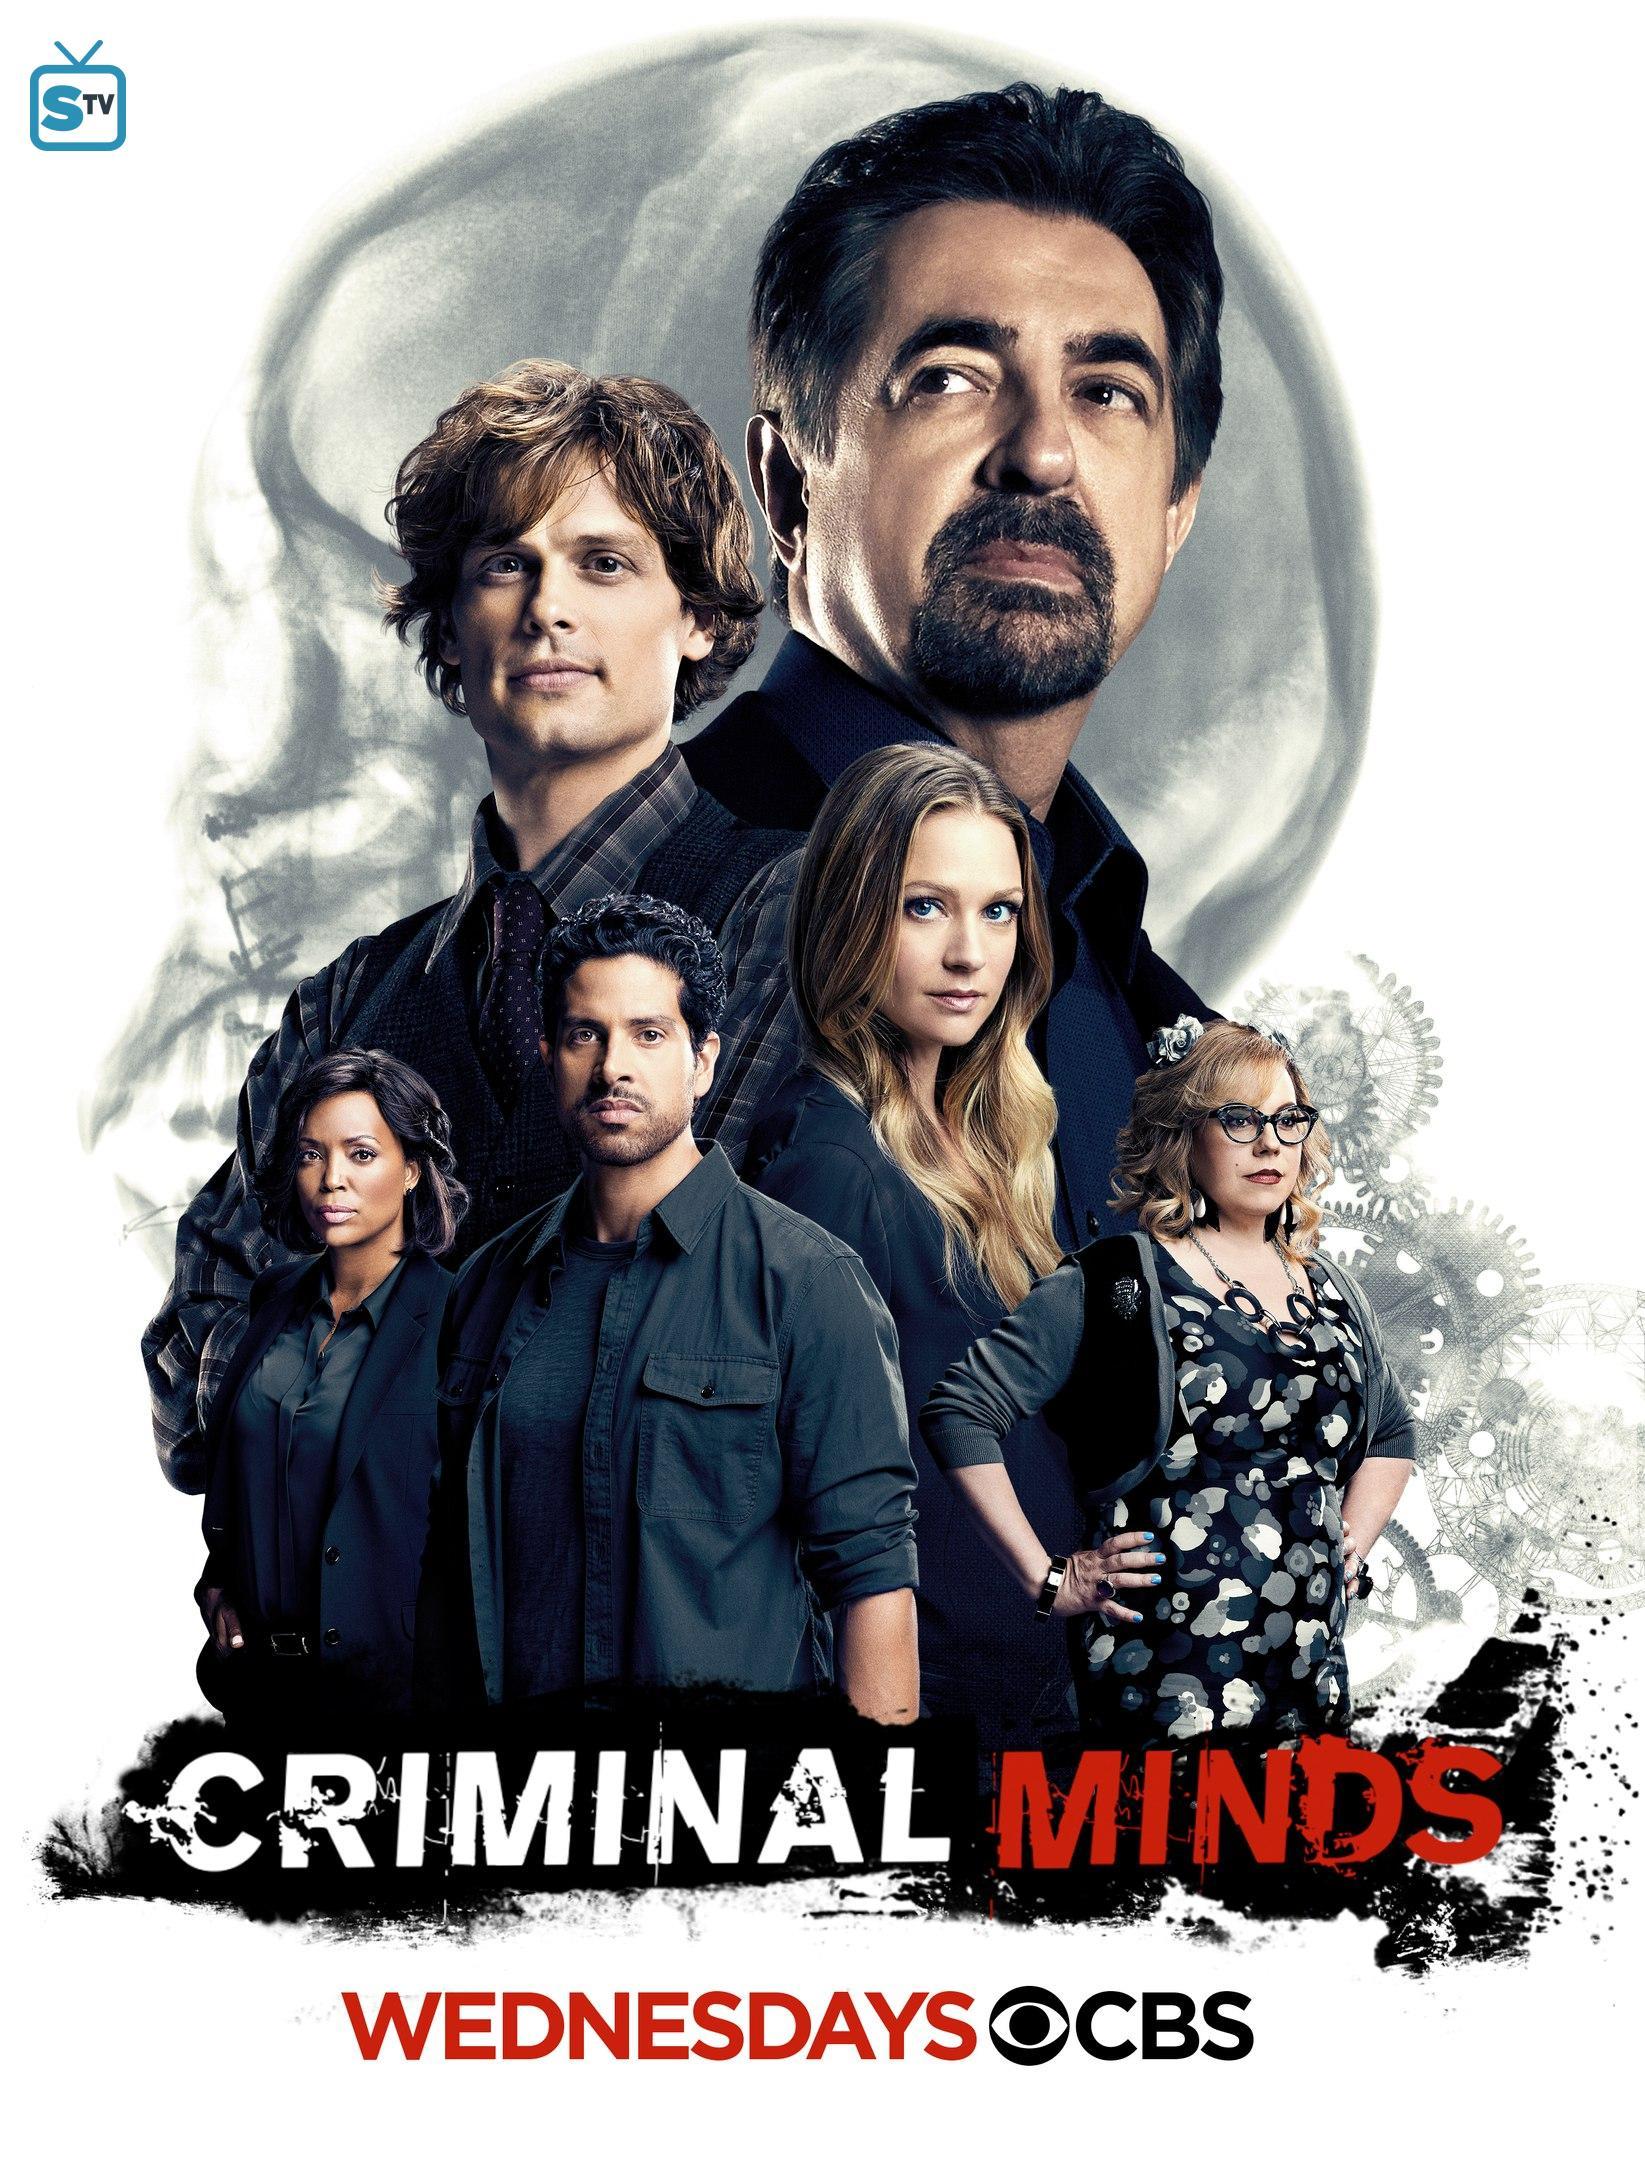 criminal minds season 12 in hd 720p